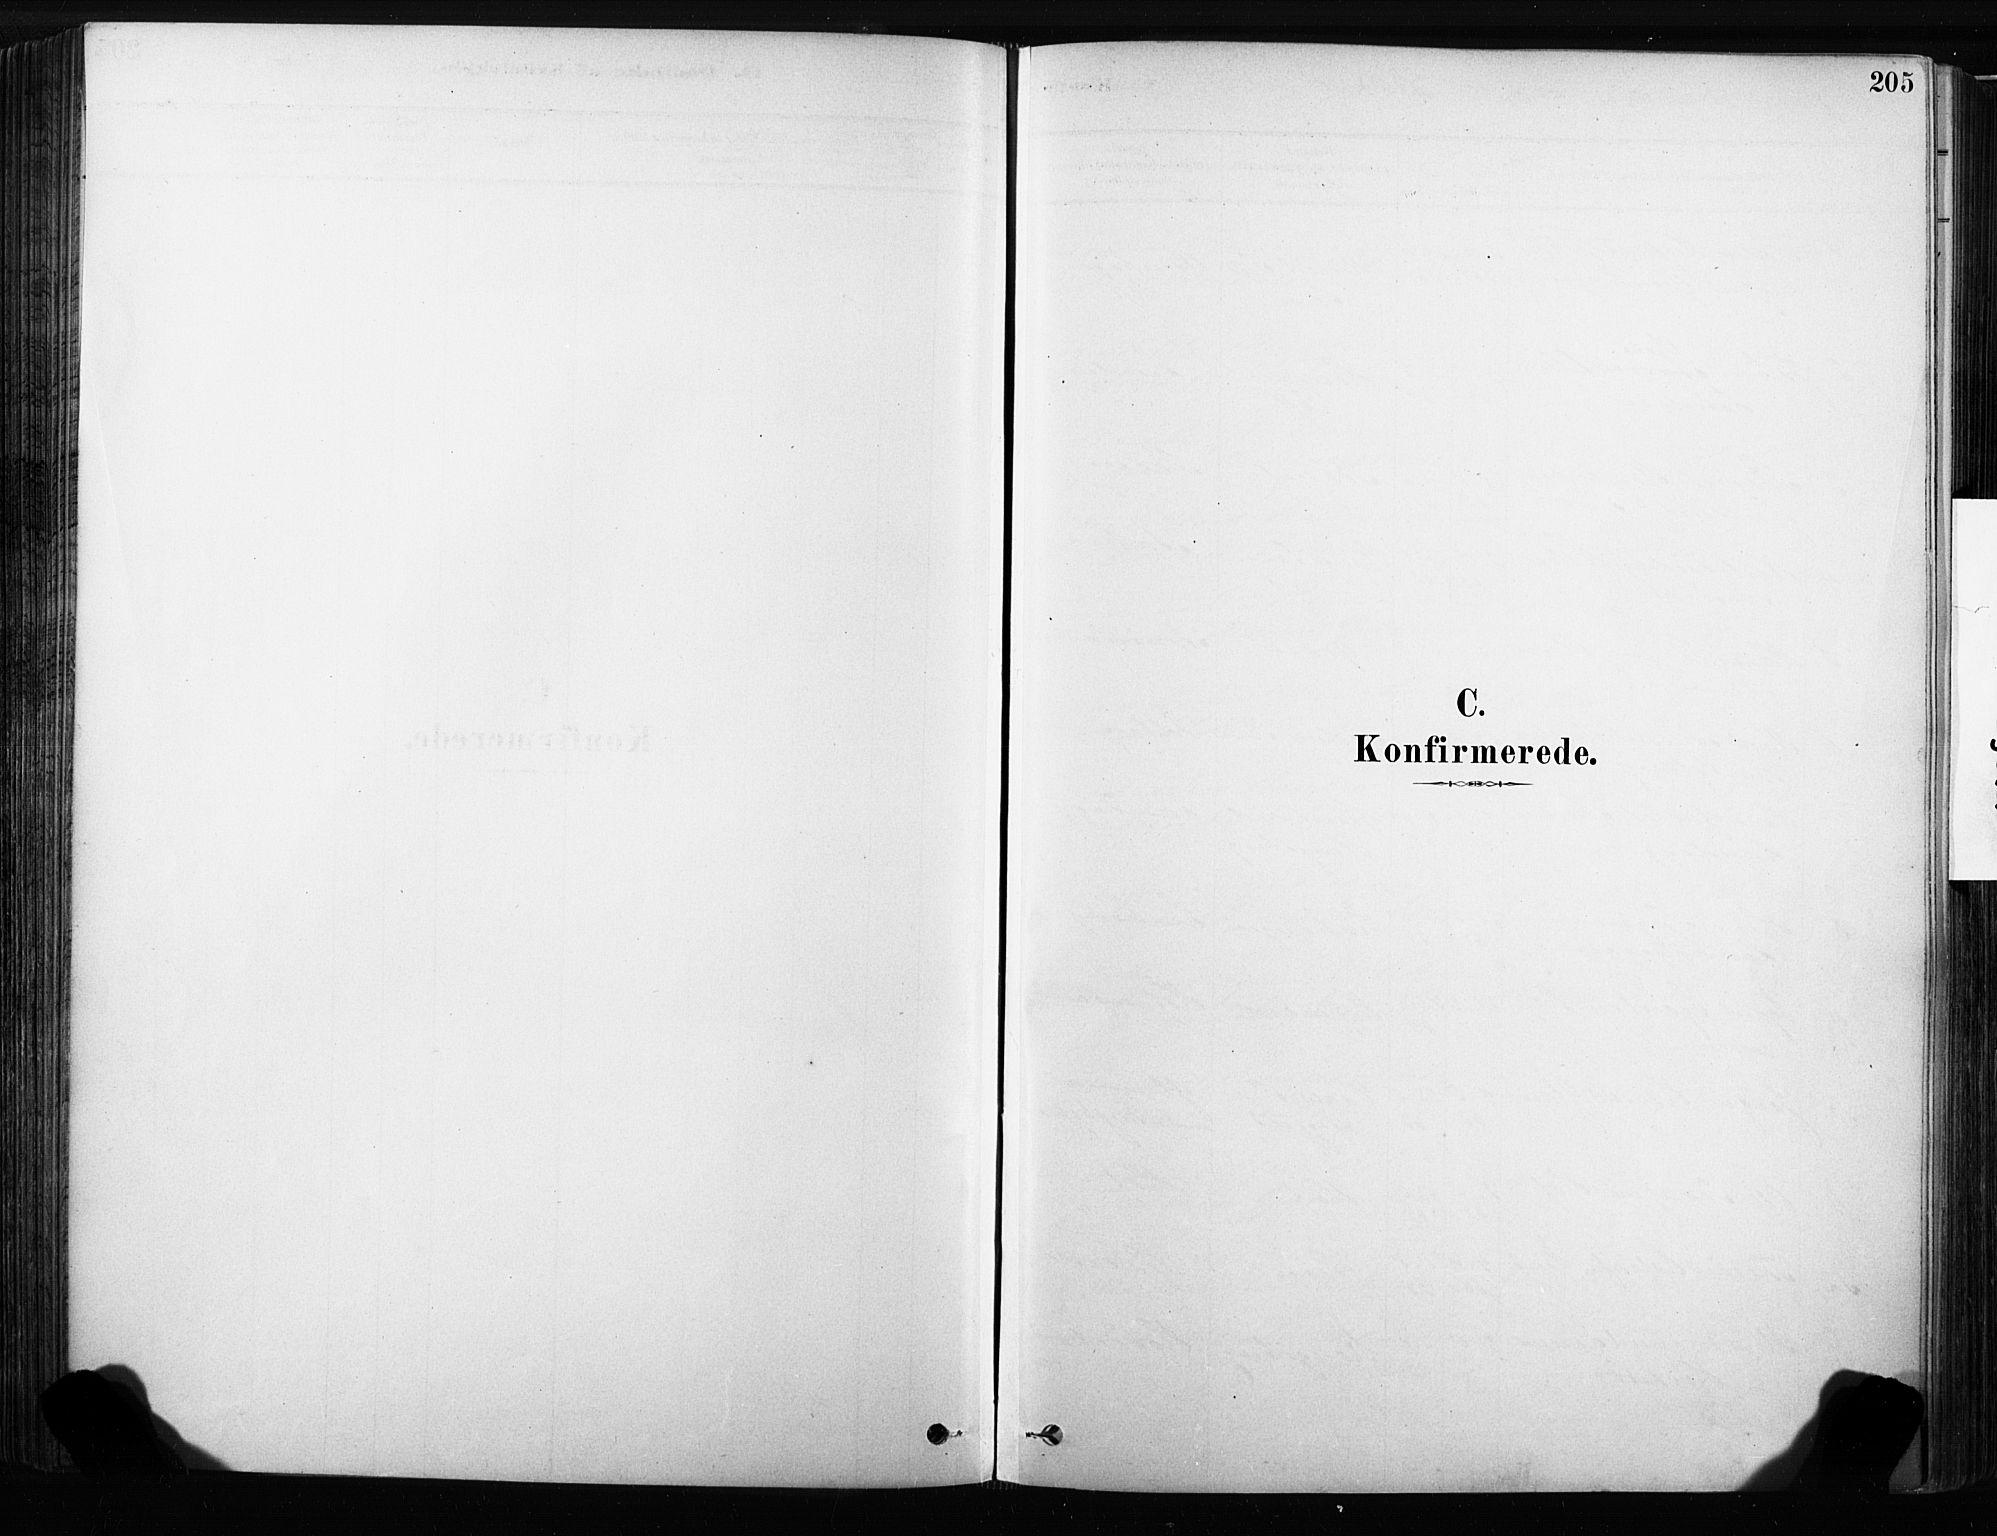 SAKO, Sandsvær kirkebøker, F/Fb/L0001: Ministerialbok nr. II 1, 1878-1906, s. 205